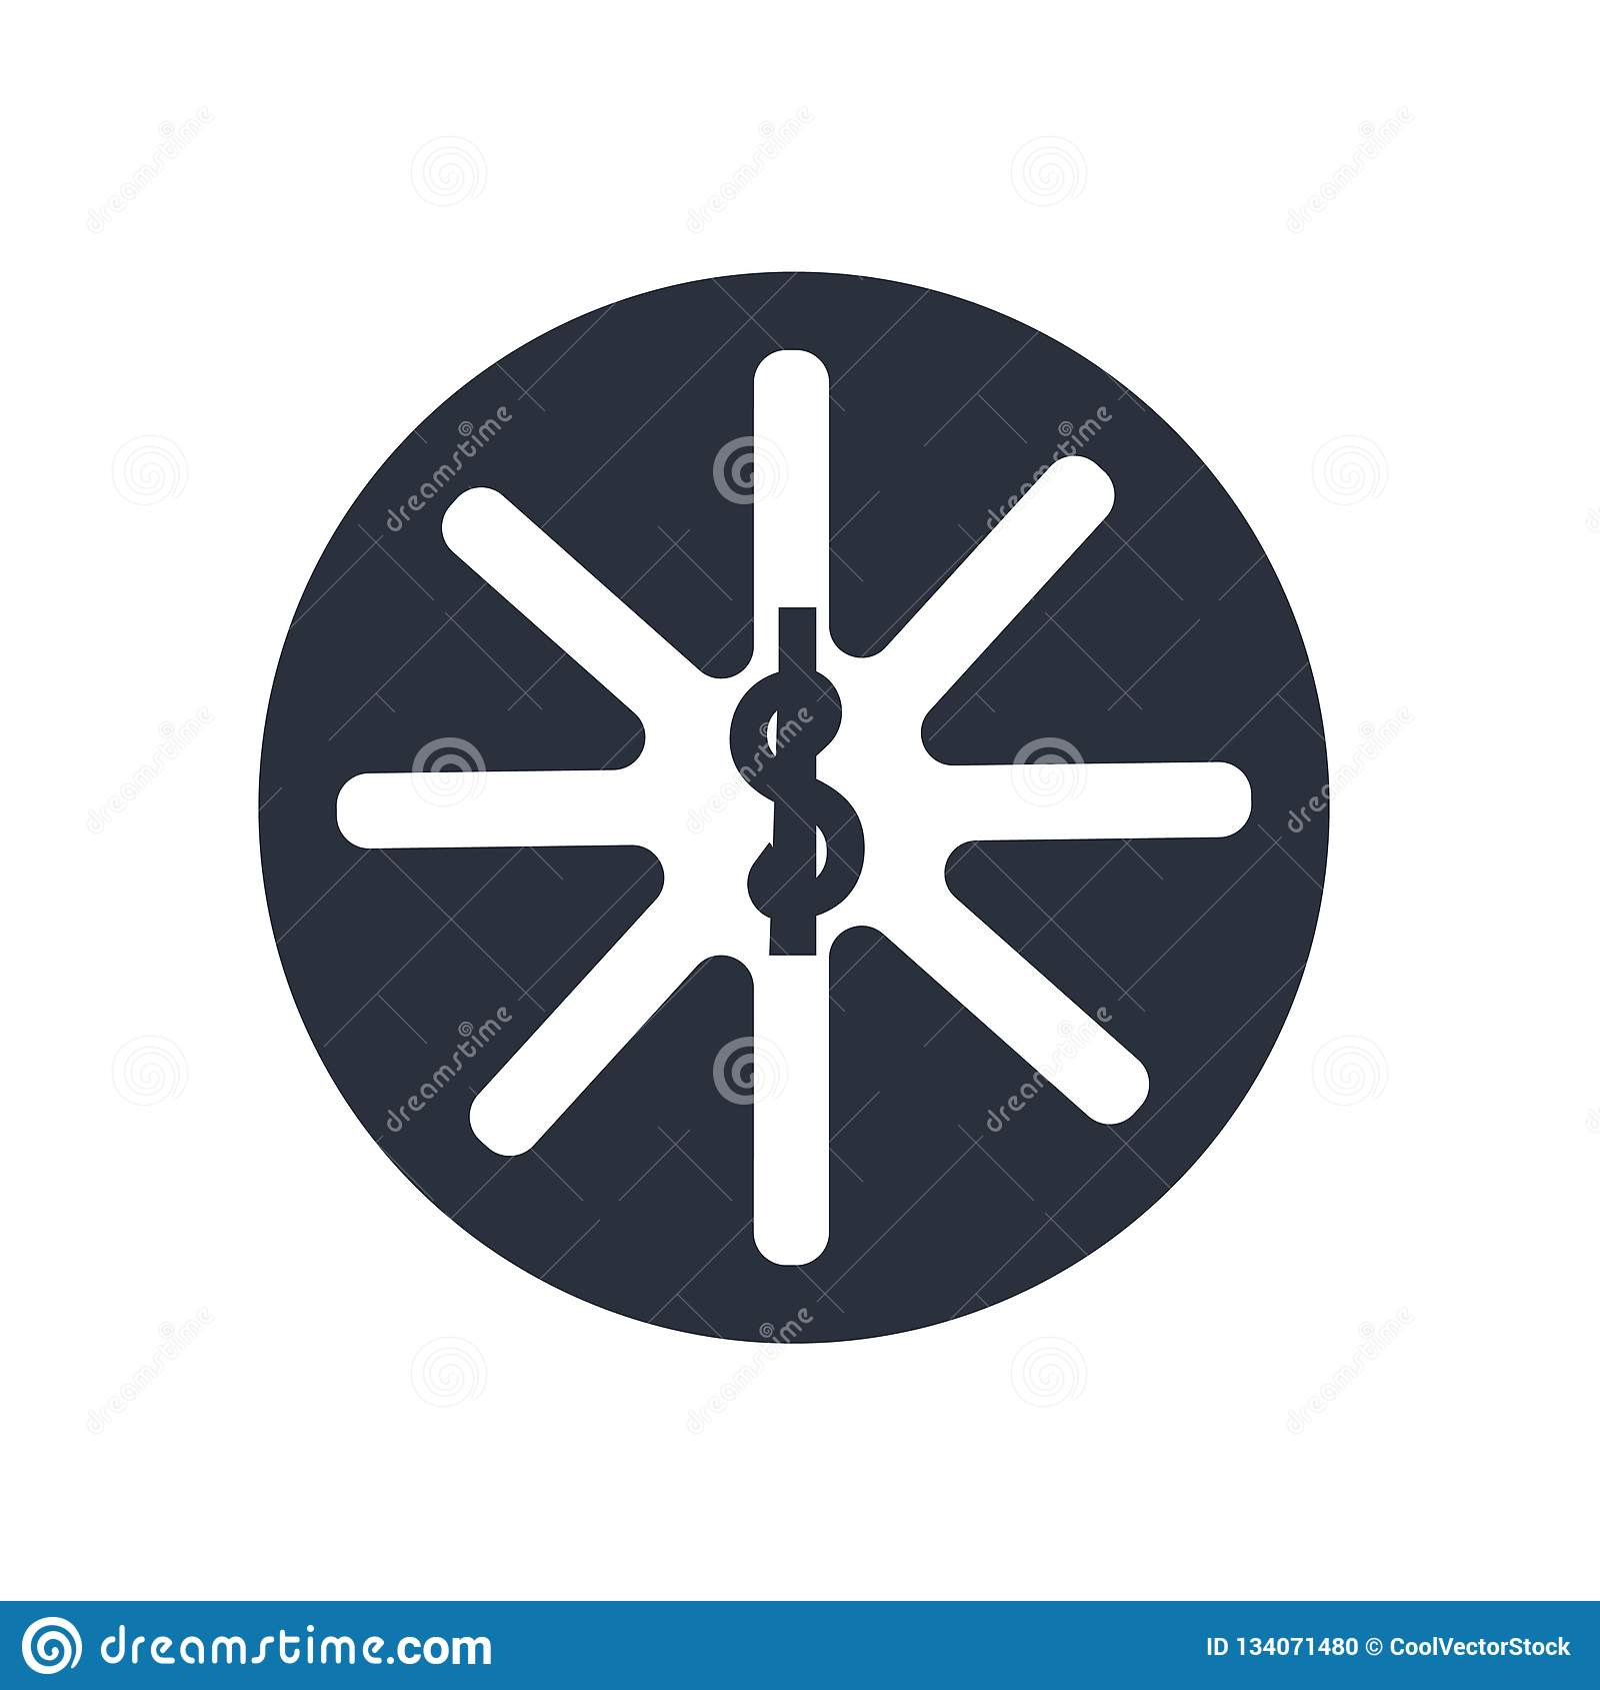 Sinal e símbolo do vetor do ícone do símbolo da farmácia isolados no fundo branco, conceito do logotipo do símbolo da farmácia